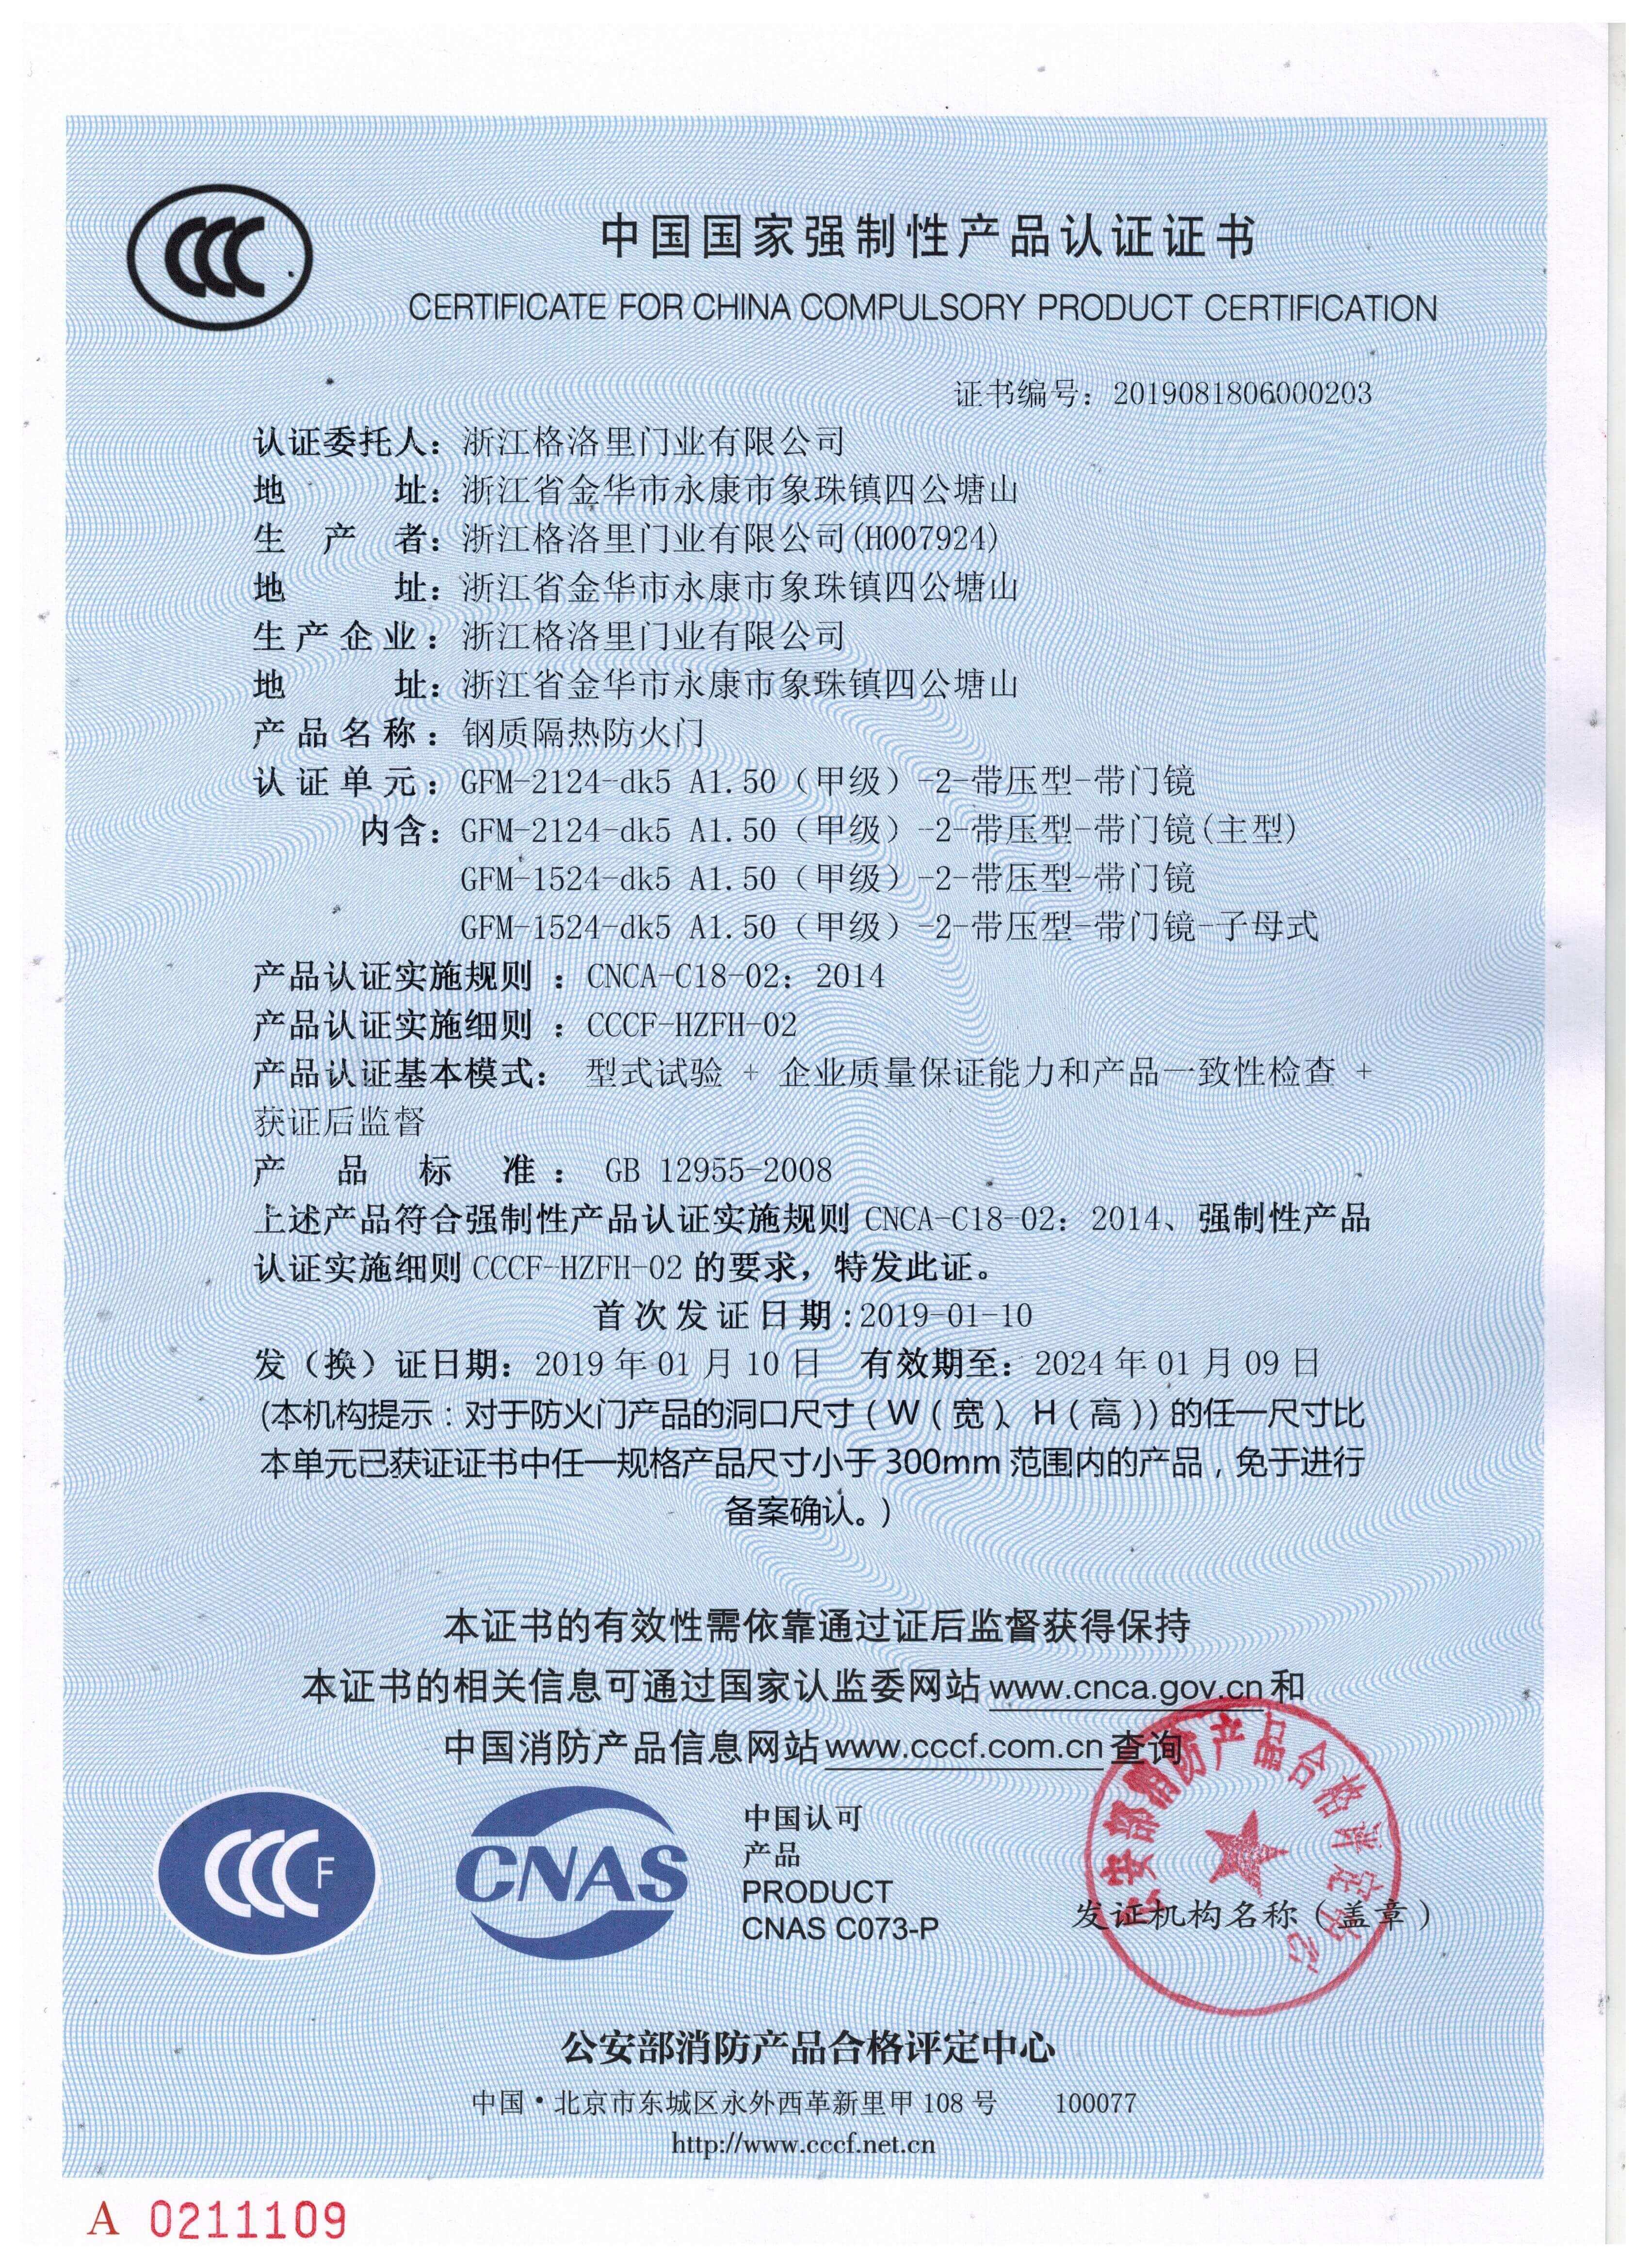 GFM-2124-dk5 A1.50(甲级)-2-带压型-带门镜